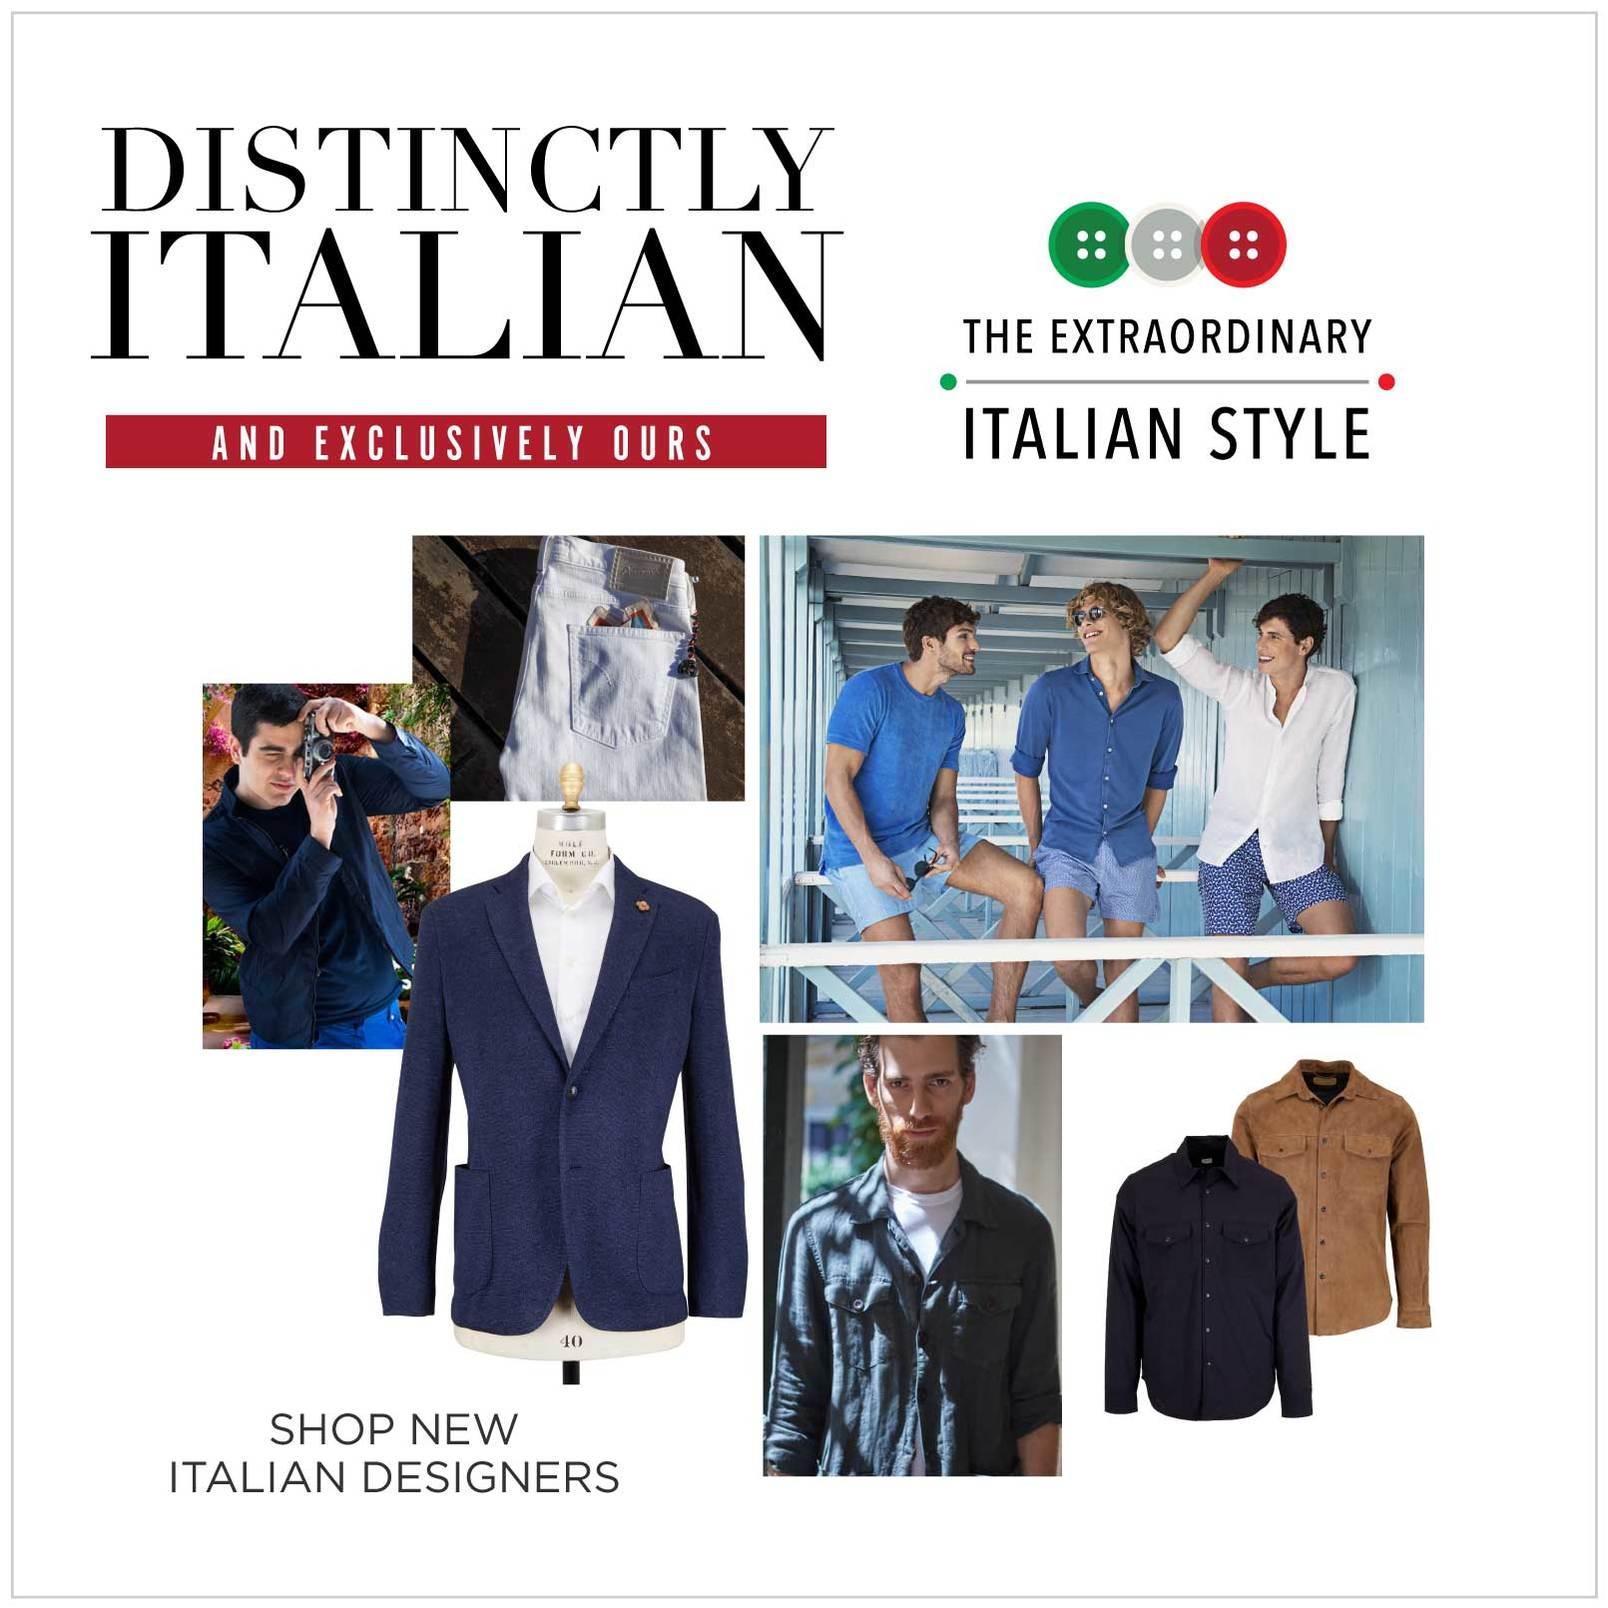 Distinctly Italian